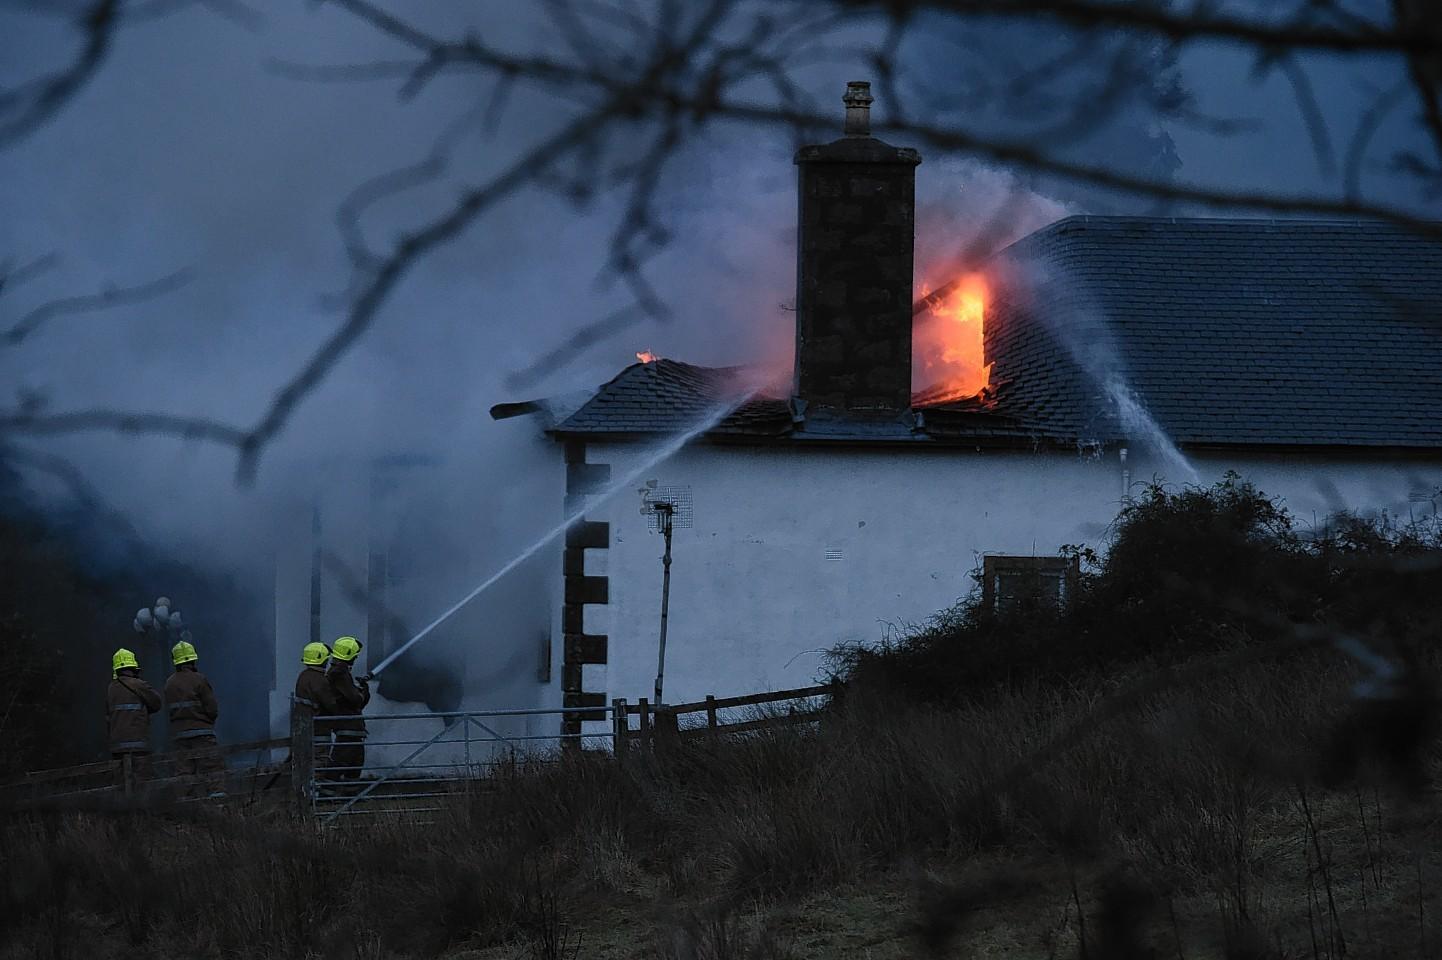 Boleskine House up in flames